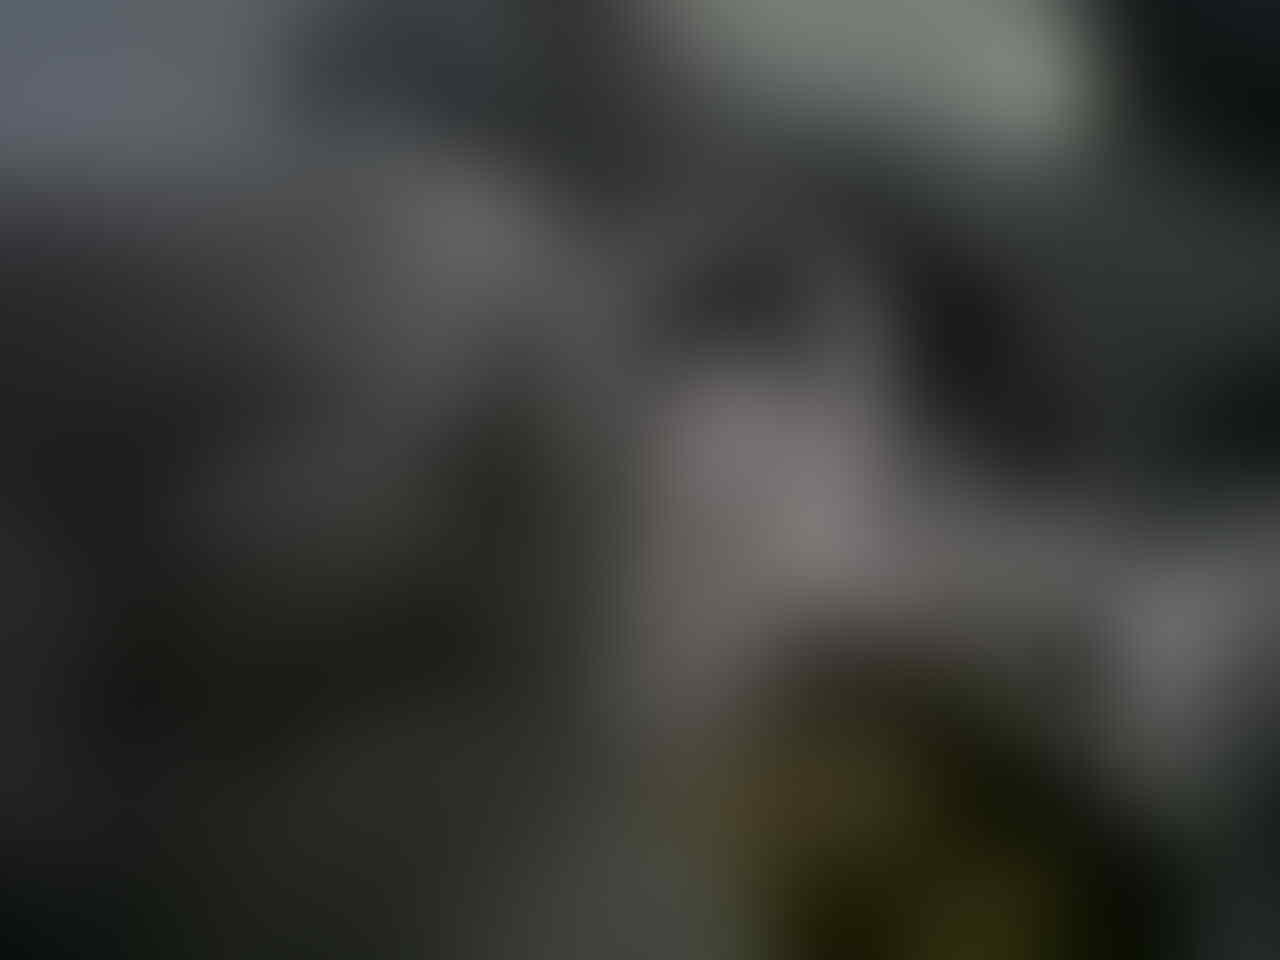 Jual Suzuki Ertiga Tipe GX Manual Warna Hitam Double Blower Tahun 2013